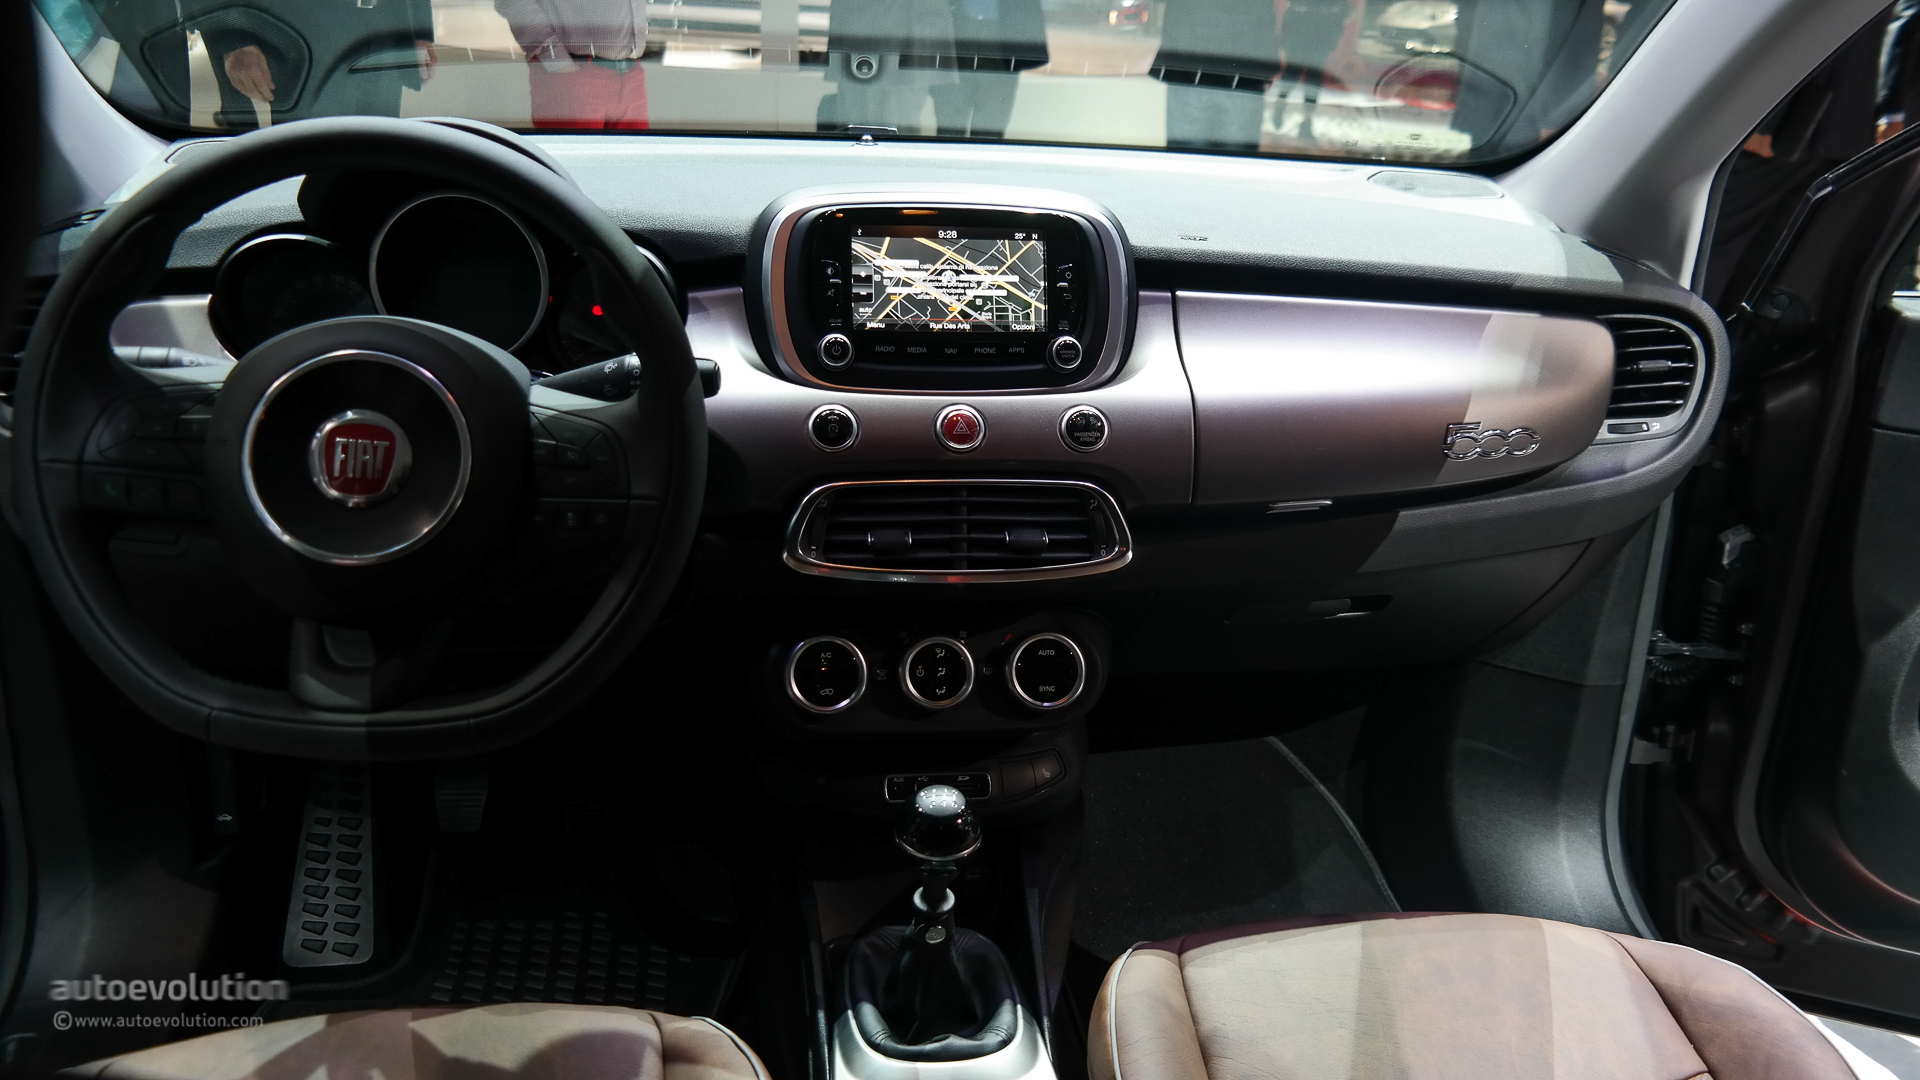 Fiat 500X Wows the Paris Motor Show [Live Photos] - autoevolution